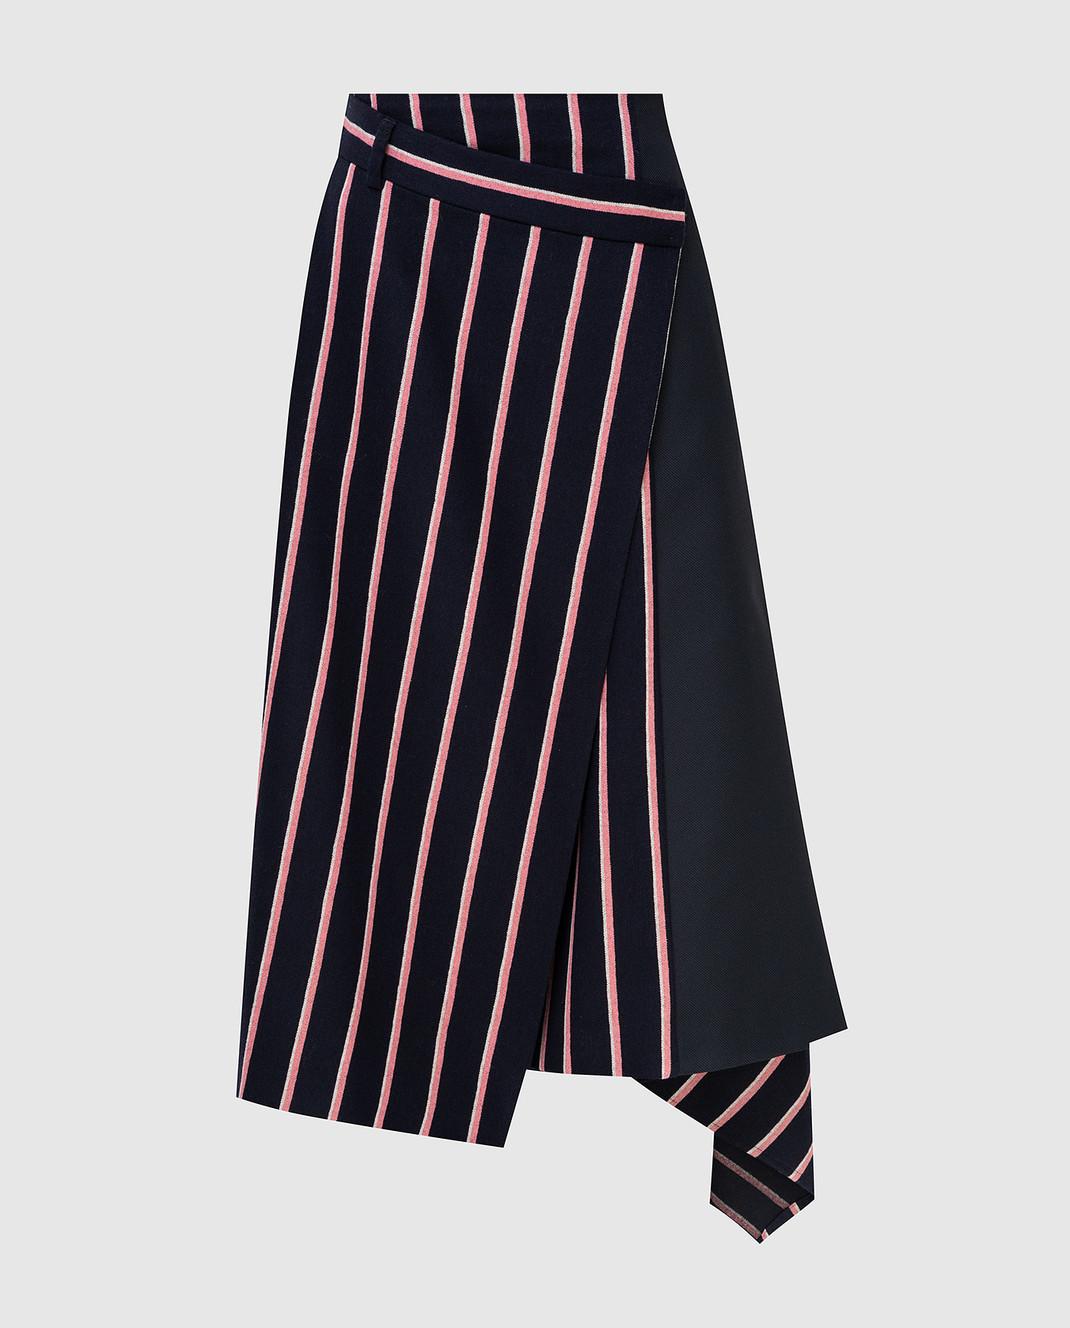 Max Mara Темно-синяя юбка из шерсти PINNE